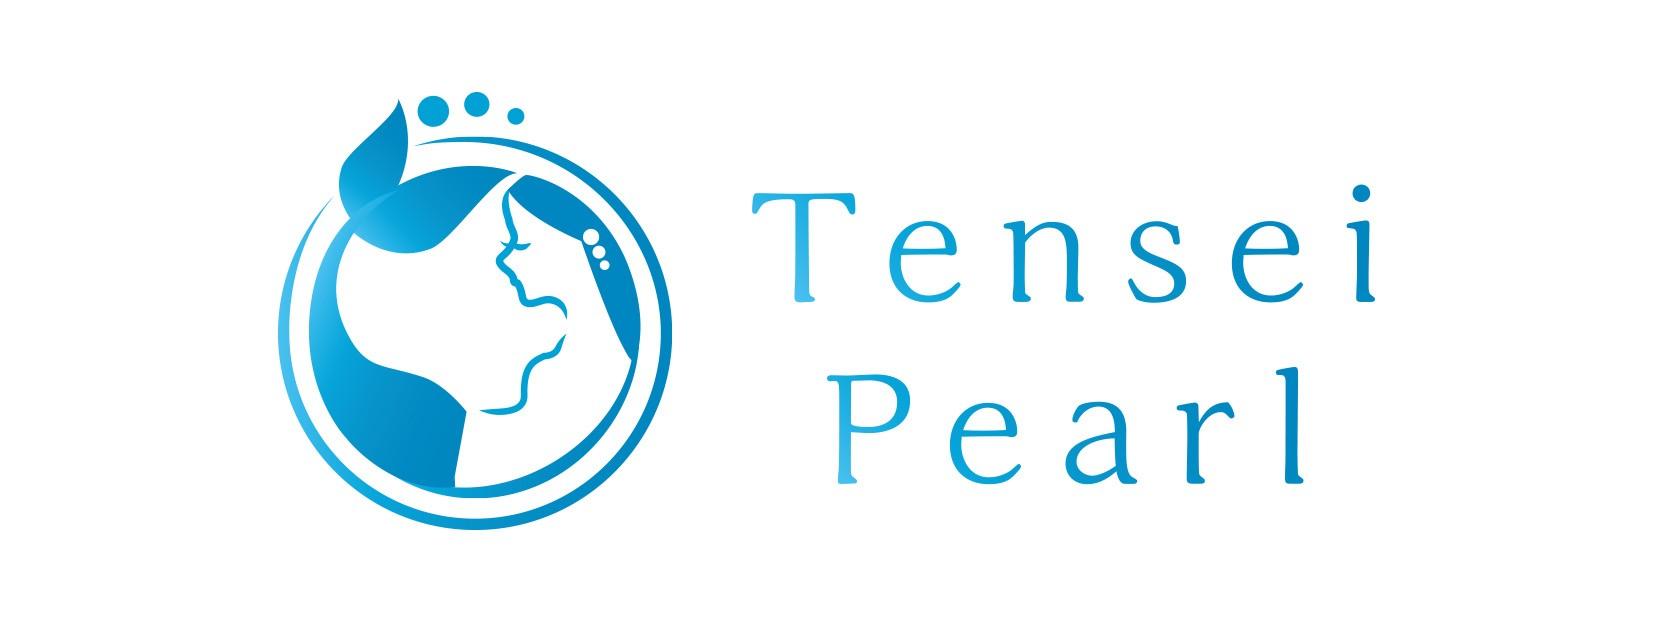 Tensei Pearl Online Store 天成真珠